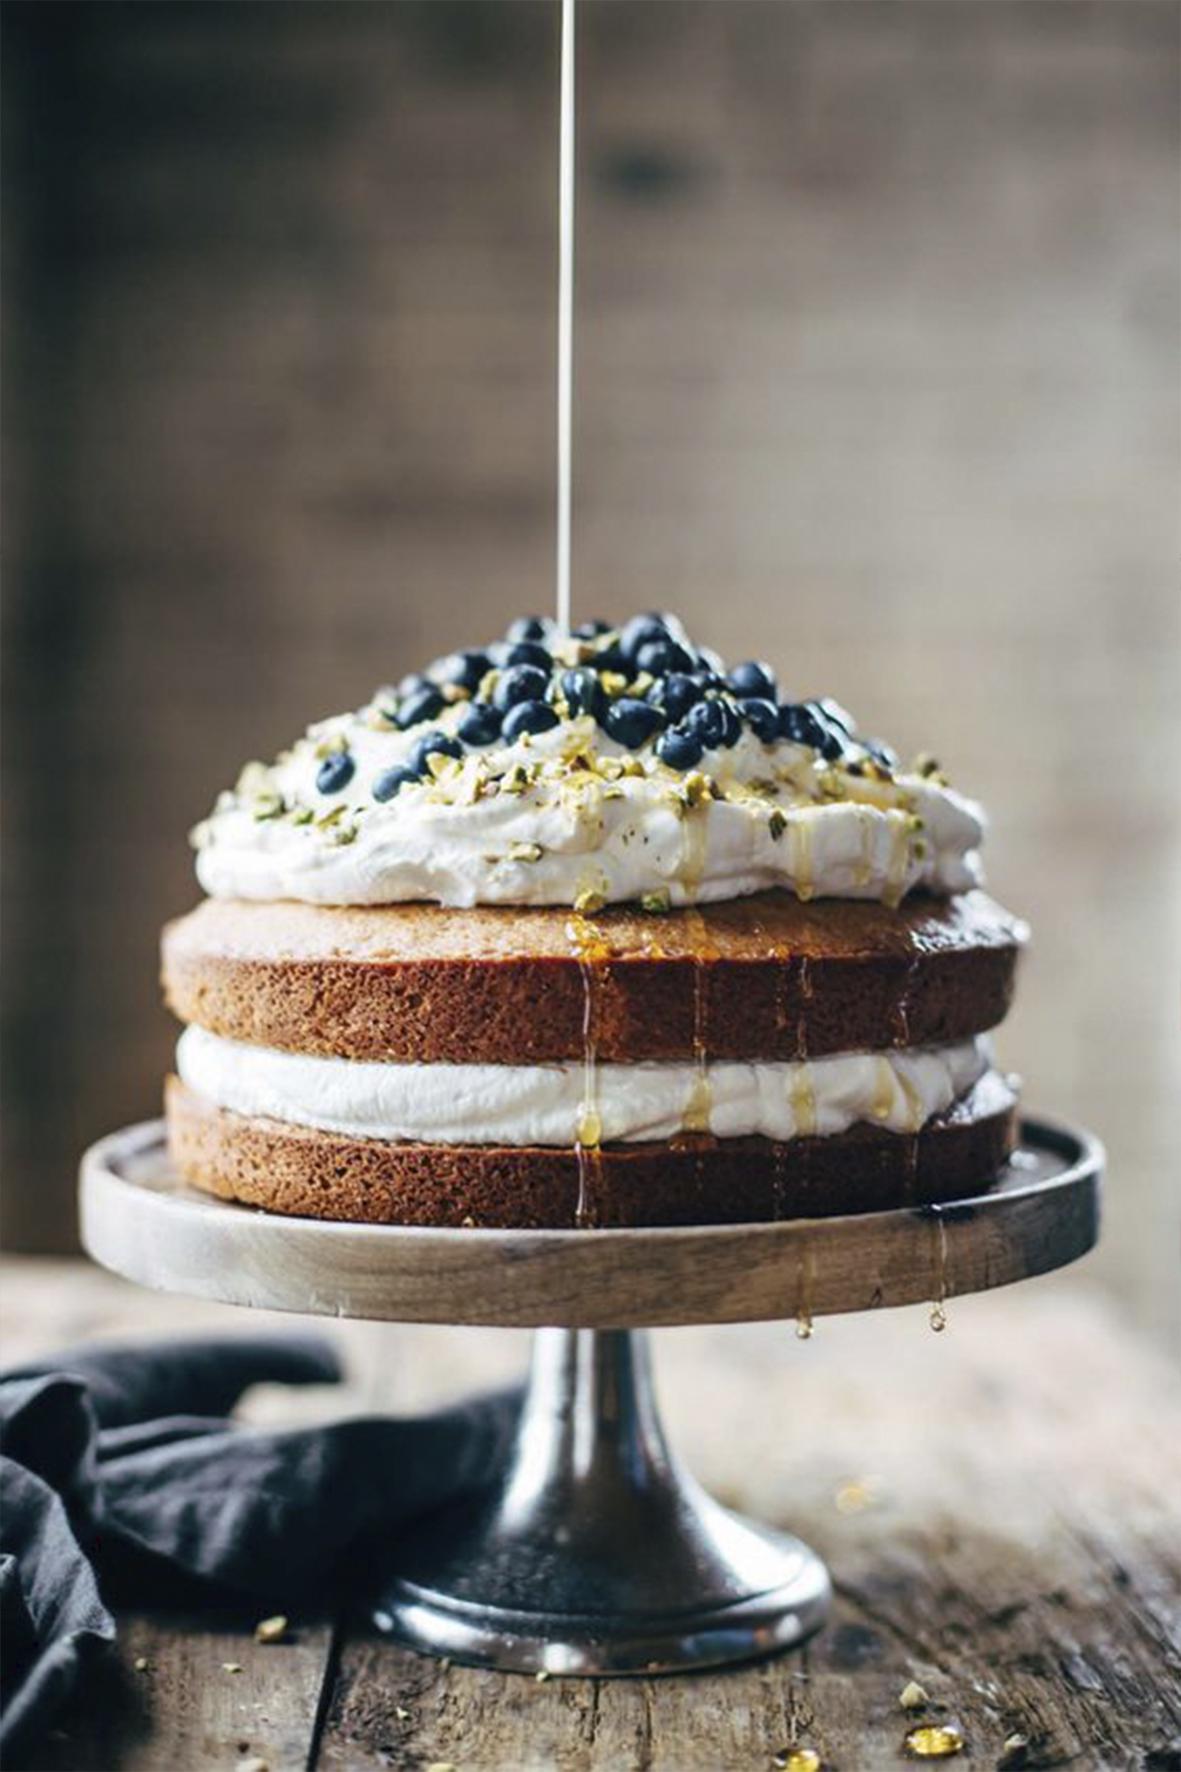 Sujets hauts_layer cake